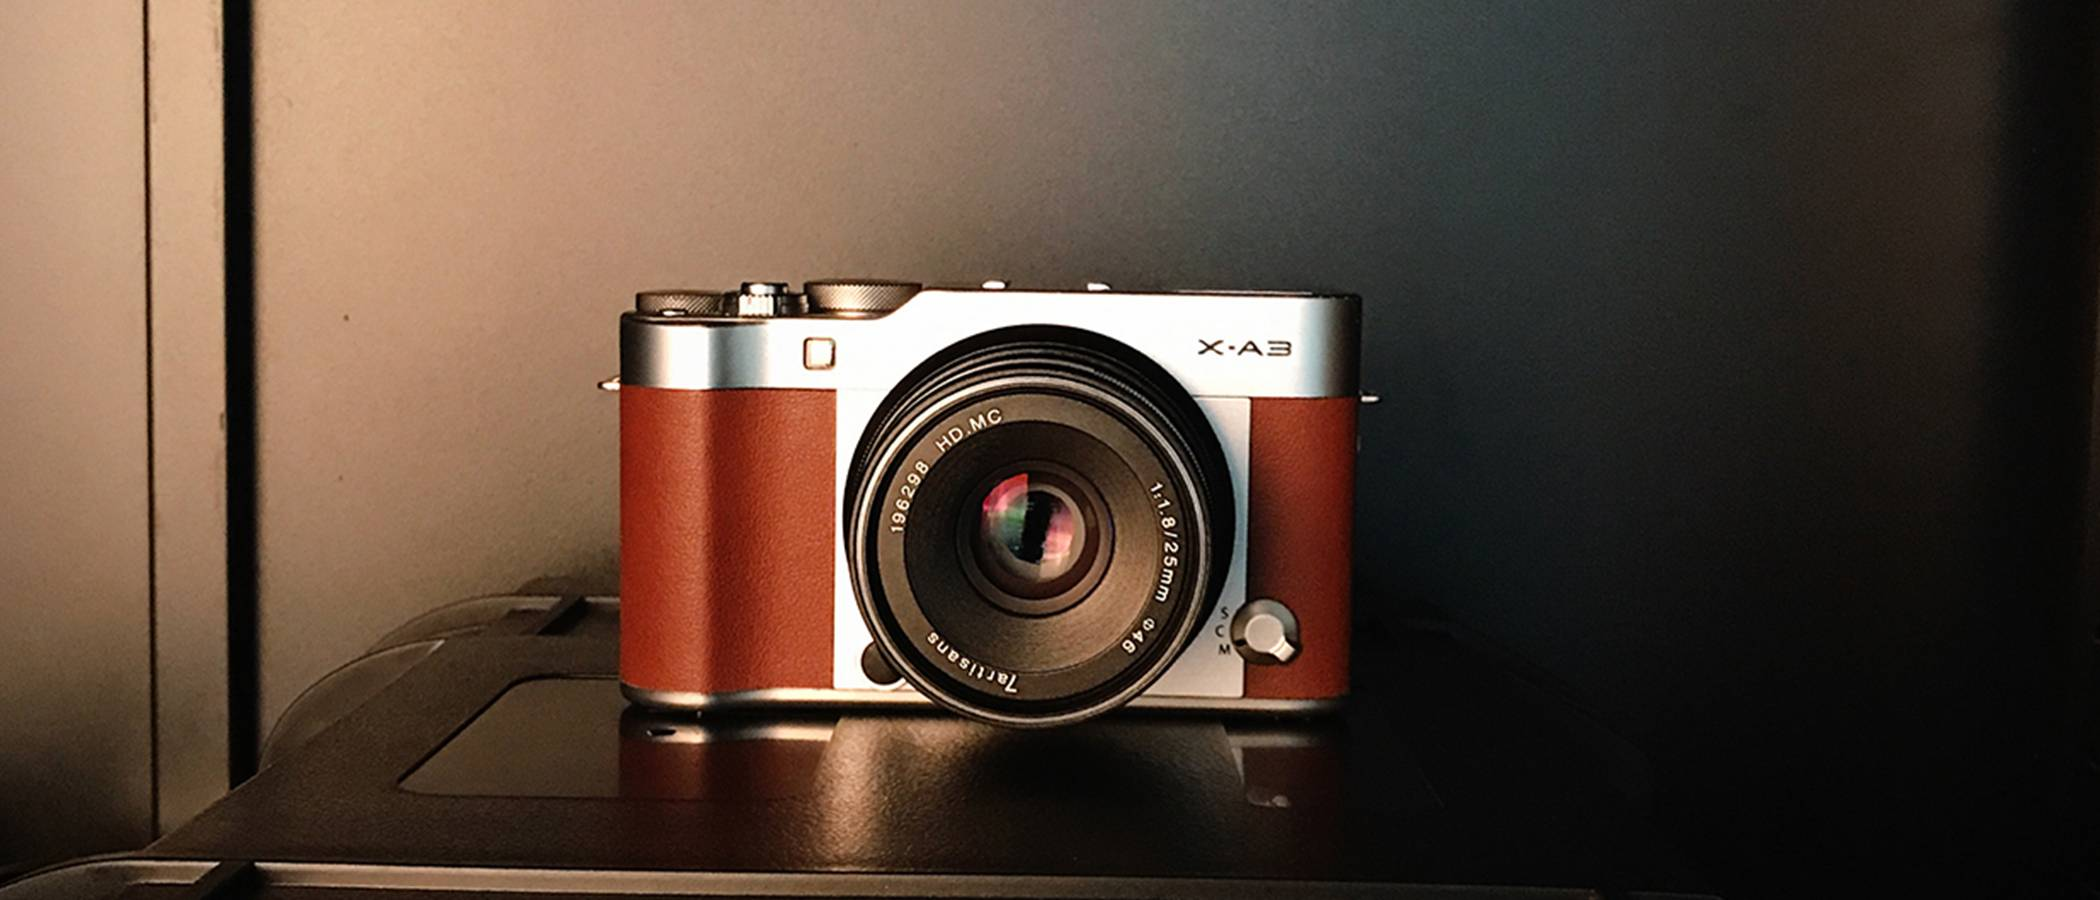 film-technika-7artisans-25-mm-aps-c-objektiv-galerie1